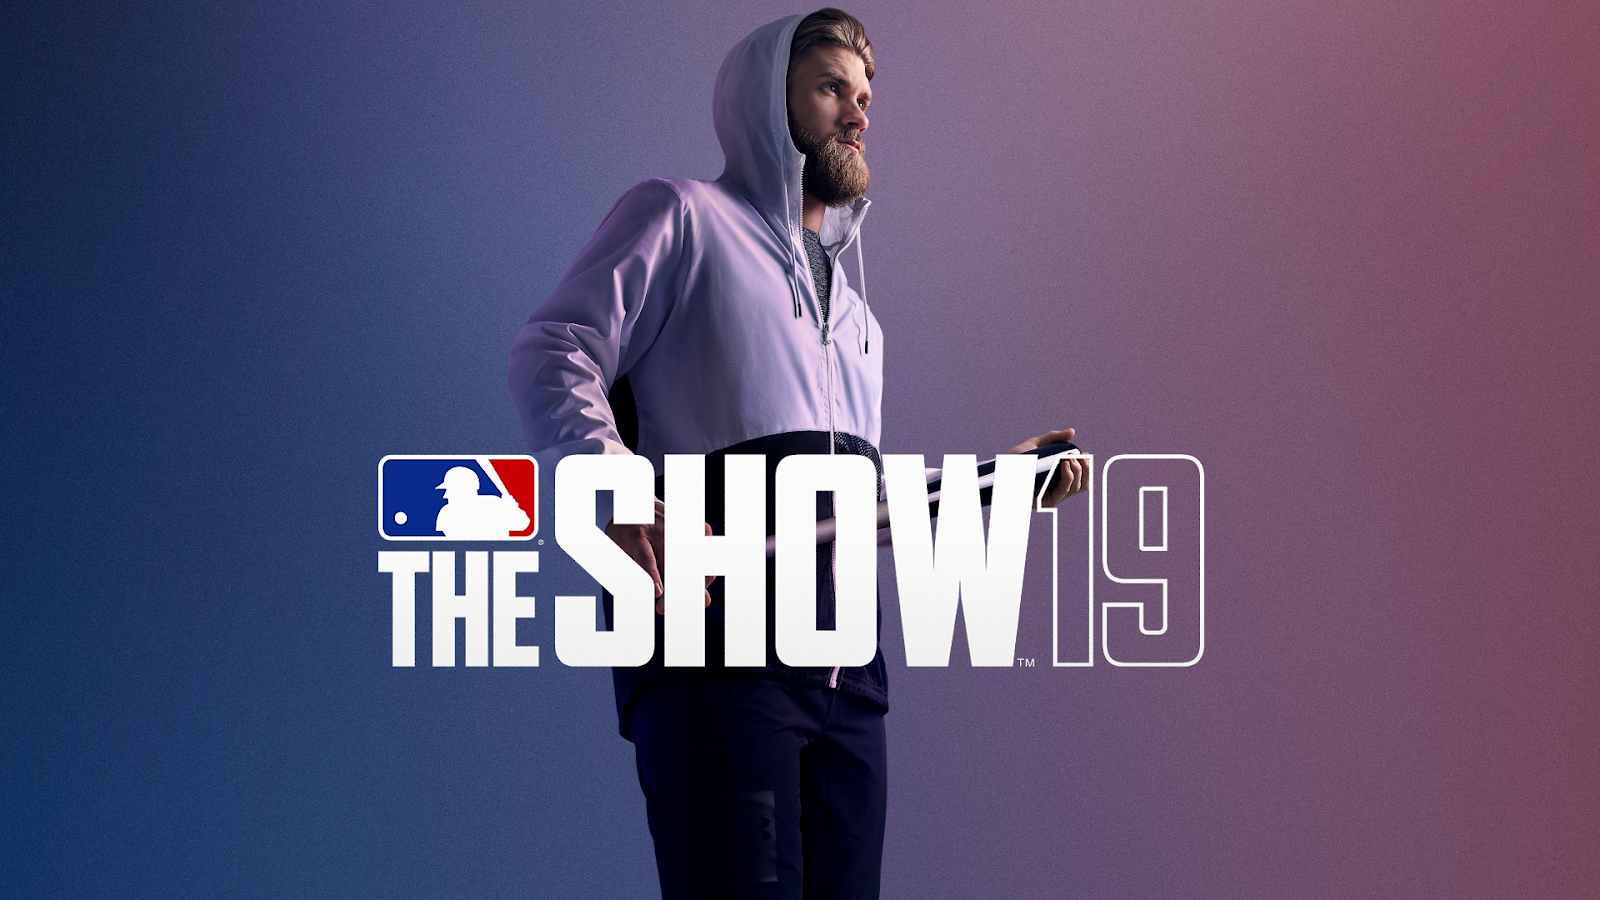 MLB The Show 19 Player Ratings That Make No Sense